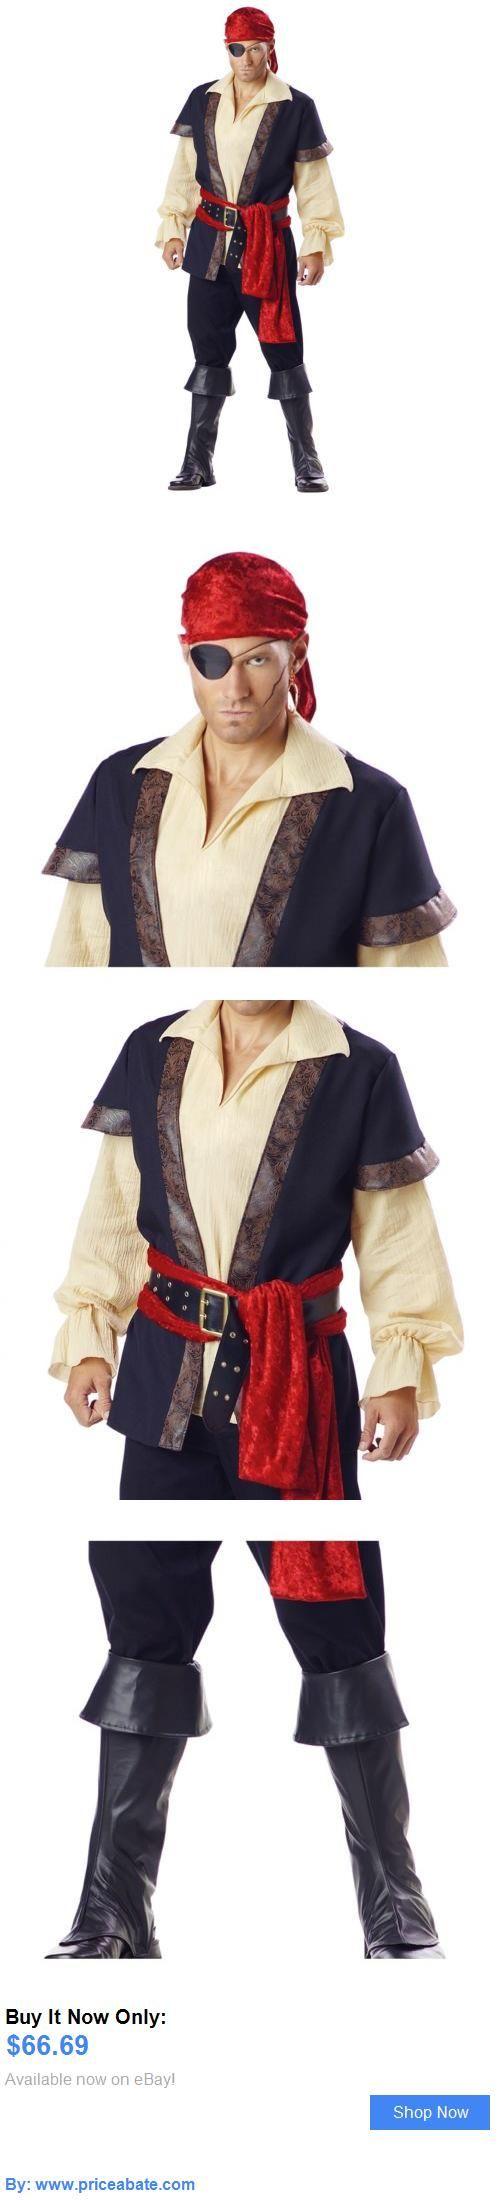 Men Costumes: Pirate Costume Adult Halloween Fancy Dress BUY IT NOW ONLY: $66.69 #priceabateMenCostumes OR #priceabate